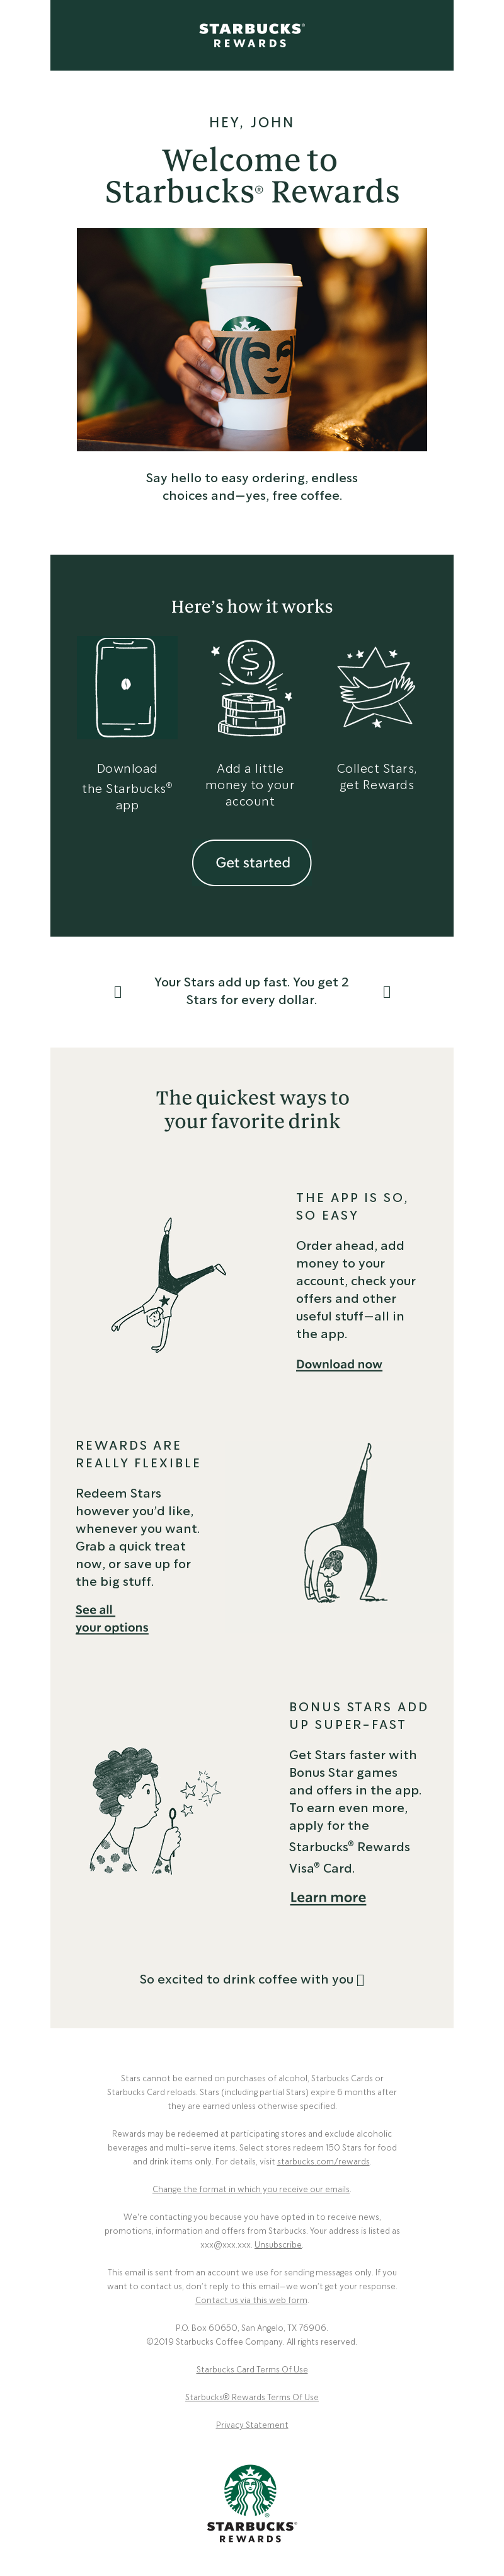 STARBUCKS® REWARDS HEY, JOHN Welcome to Starbucks® Rewards Say hello to eas